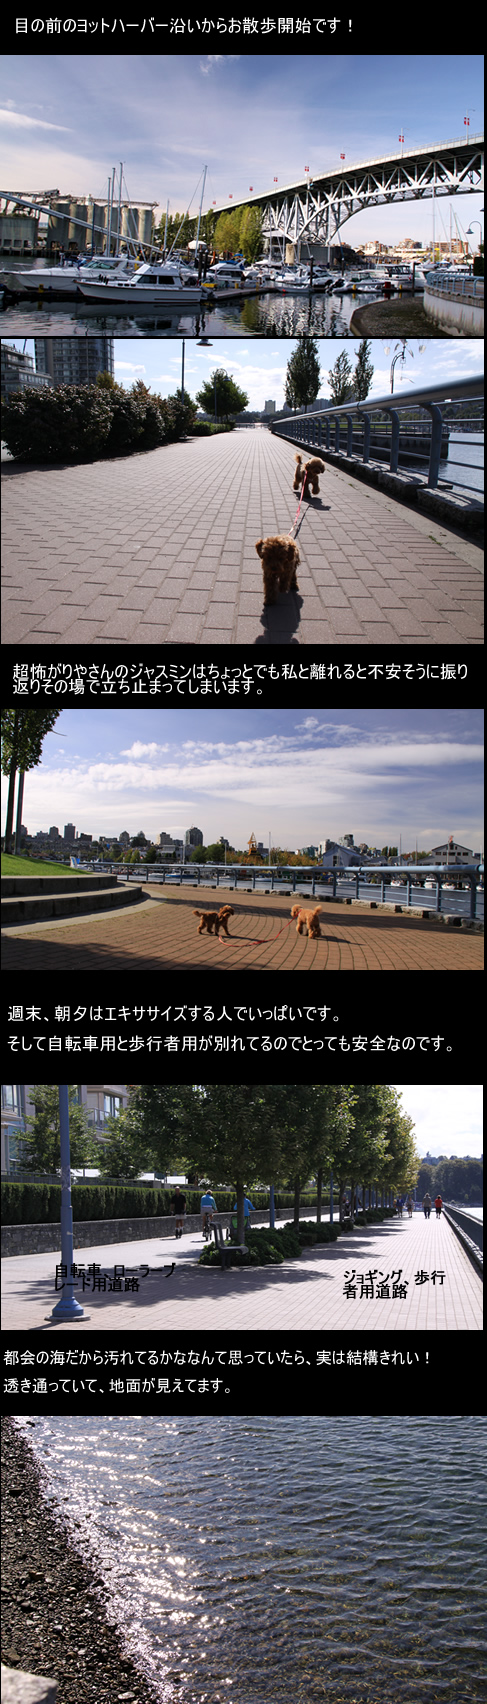 c0164491_672435.jpg